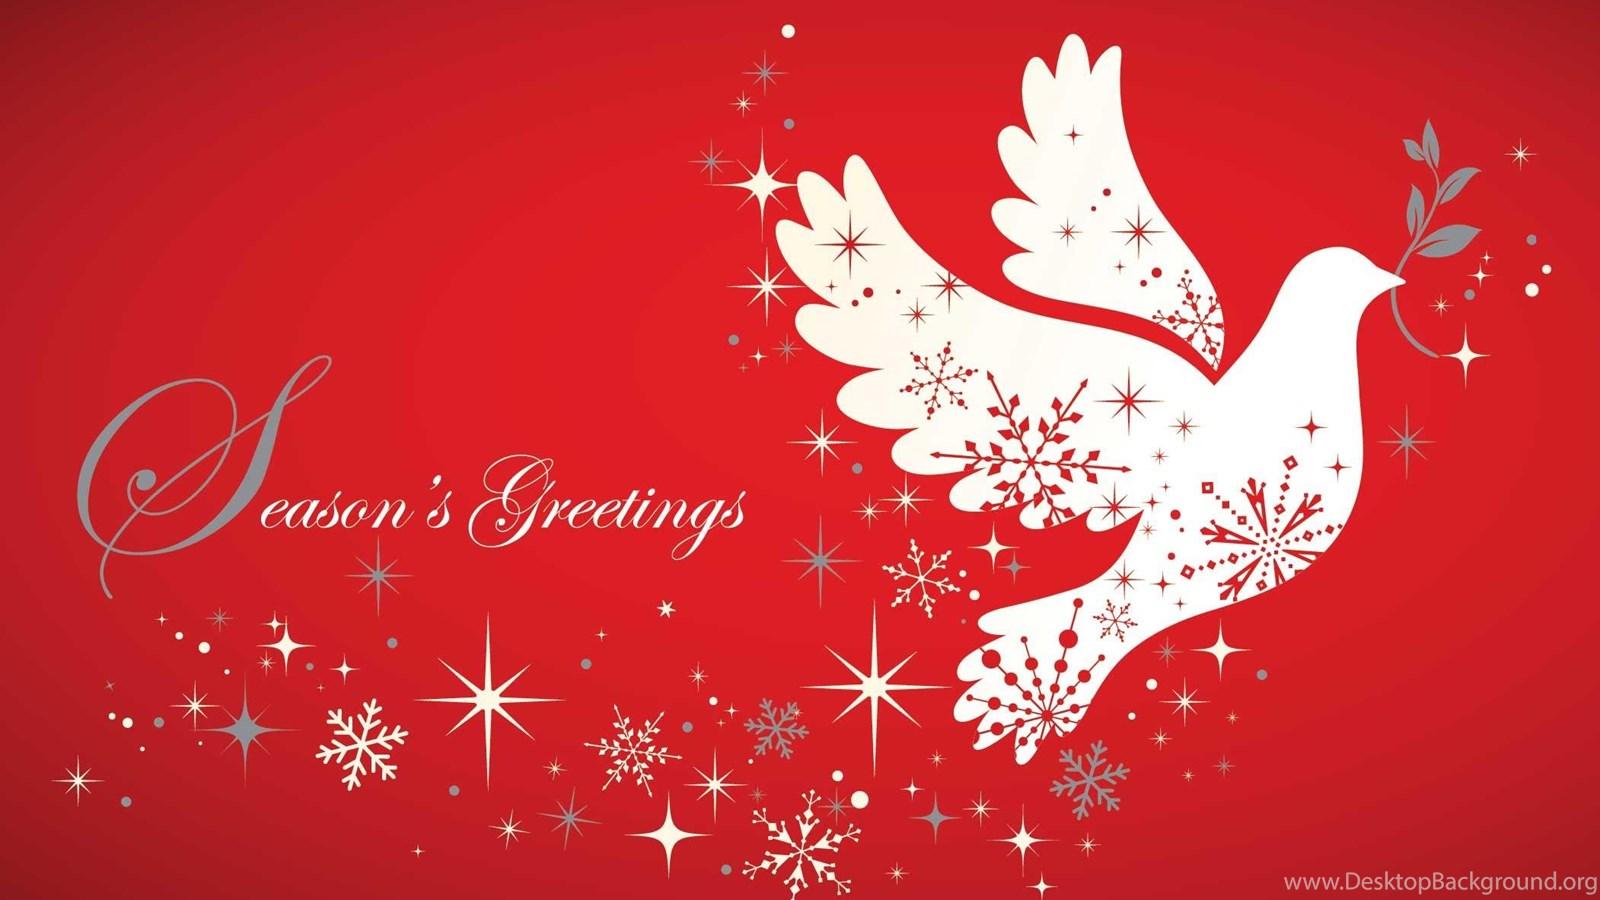 Seasons greetings and happy new year 2013 the wondrous pics desktop popular m4hsunfo